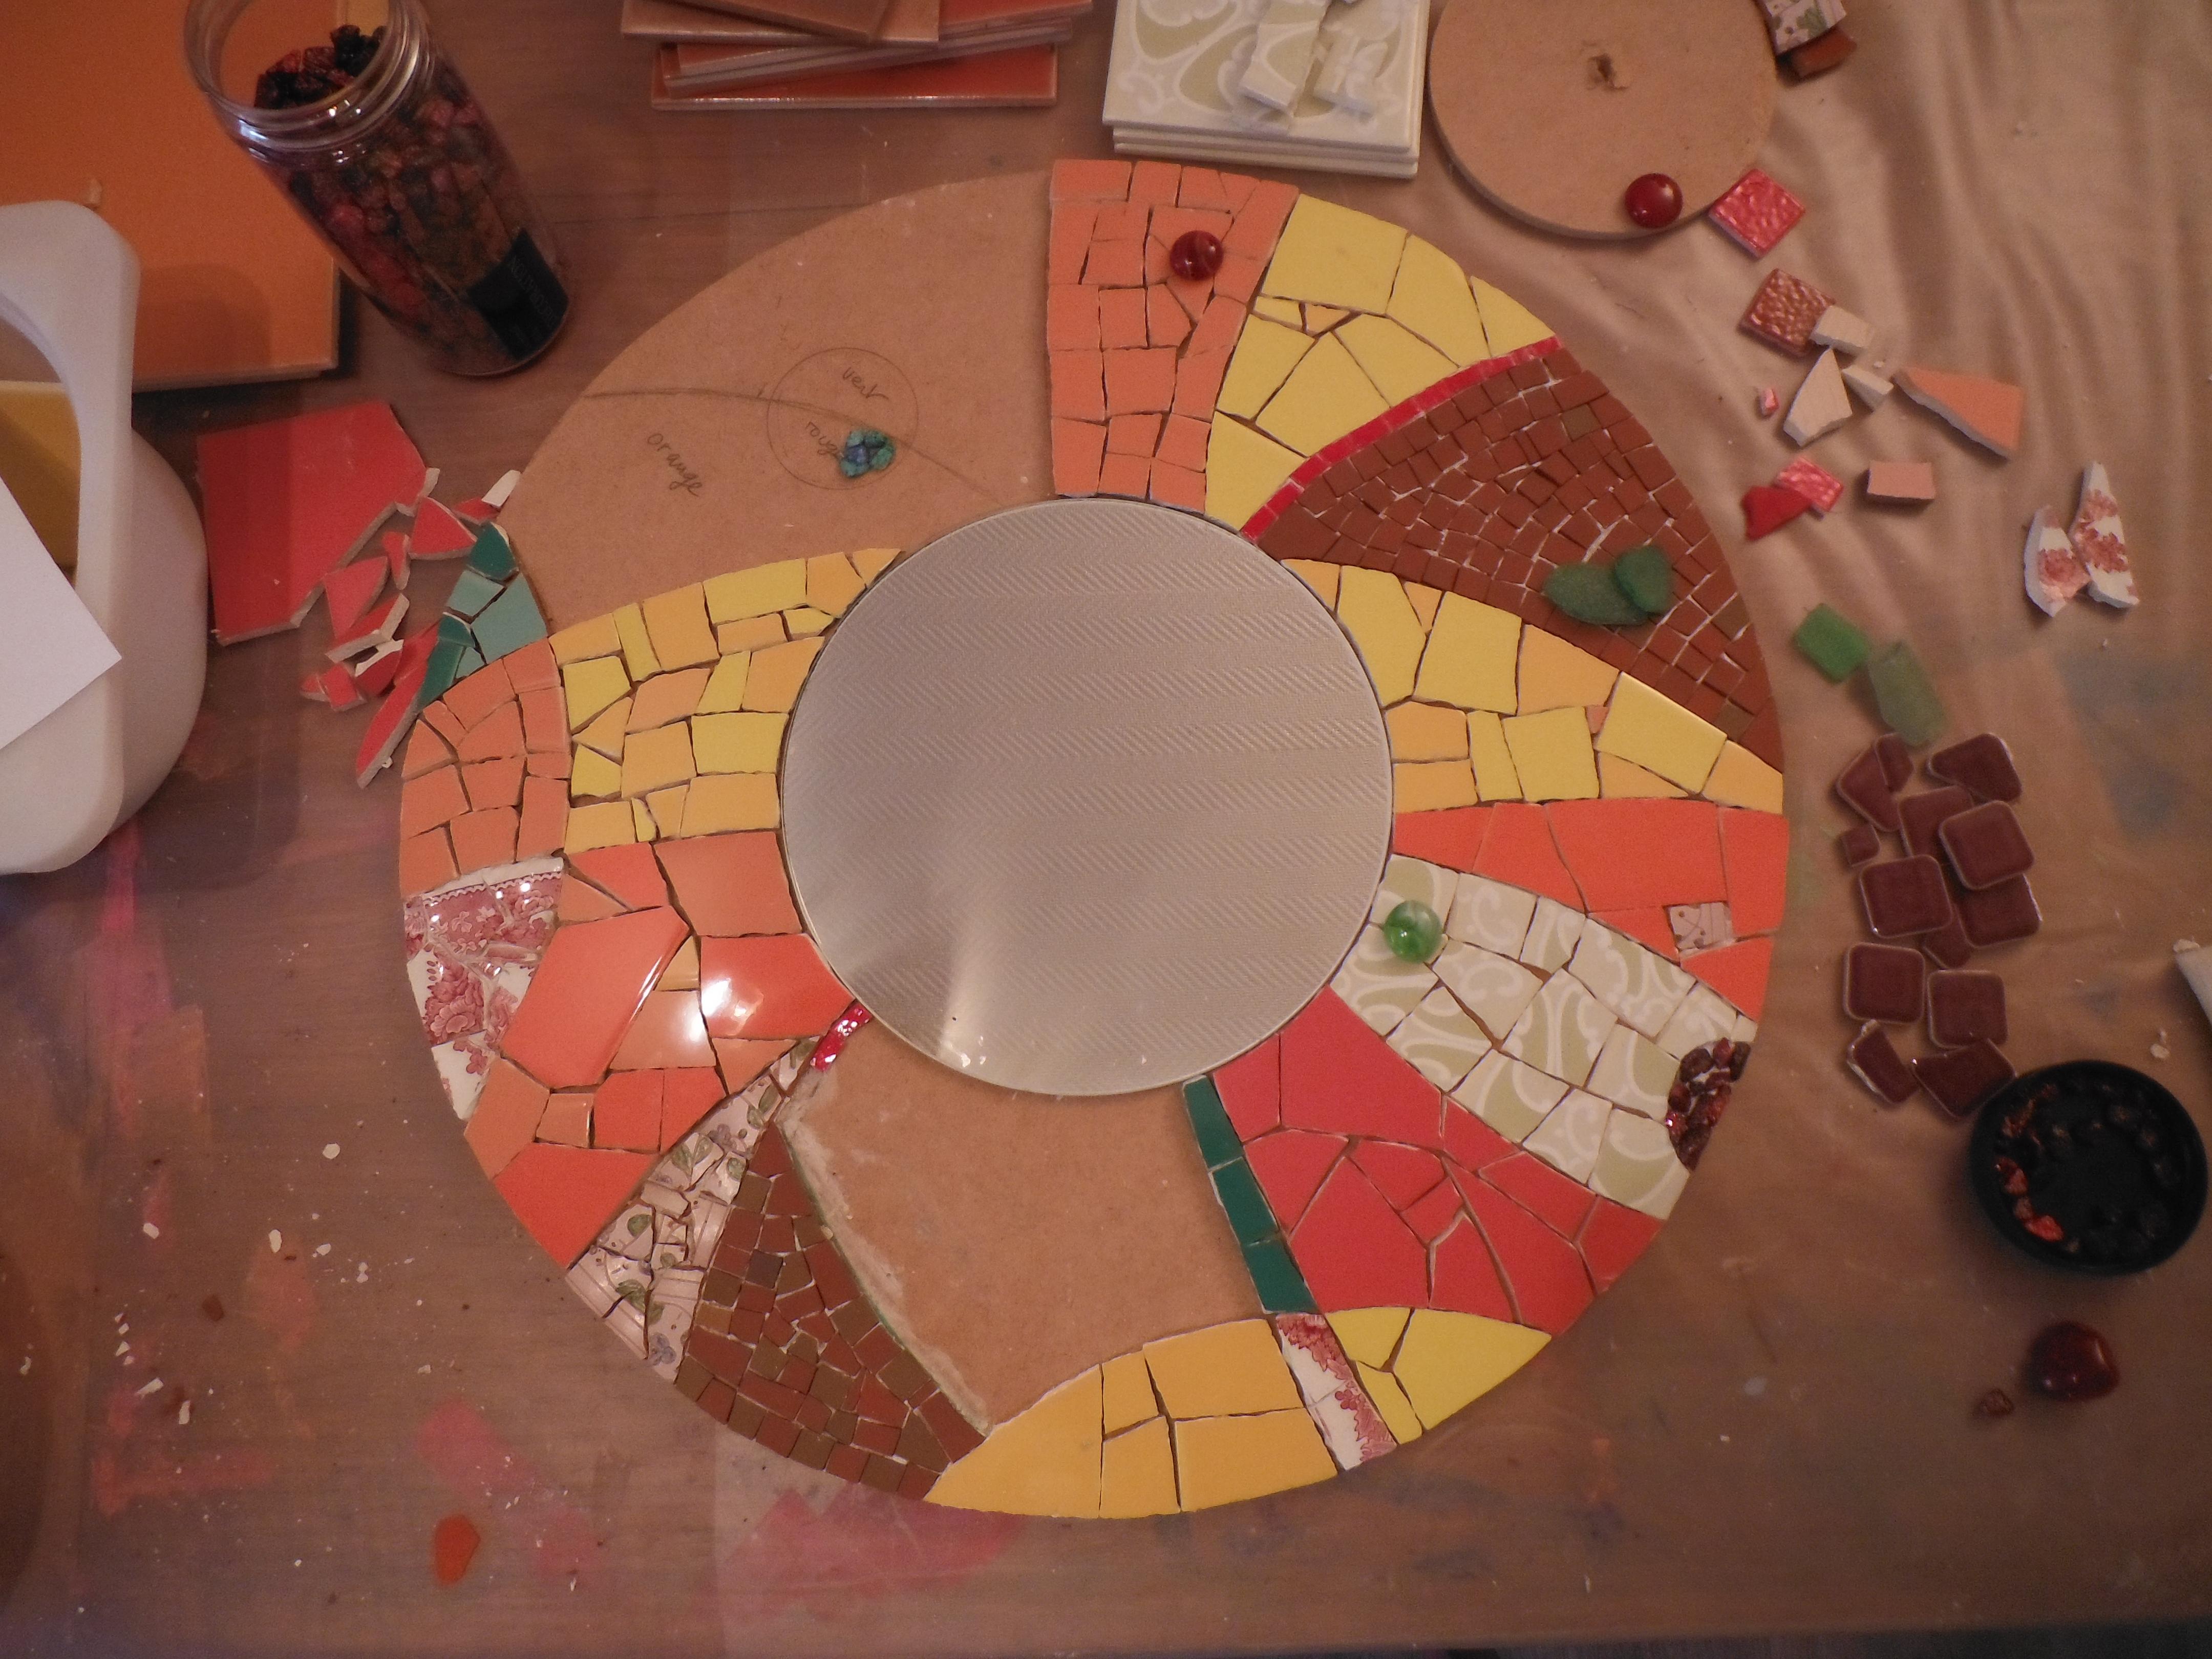 Miroir contemporain en mosa que mimi vermicelle cours for Miroir rond contemporain